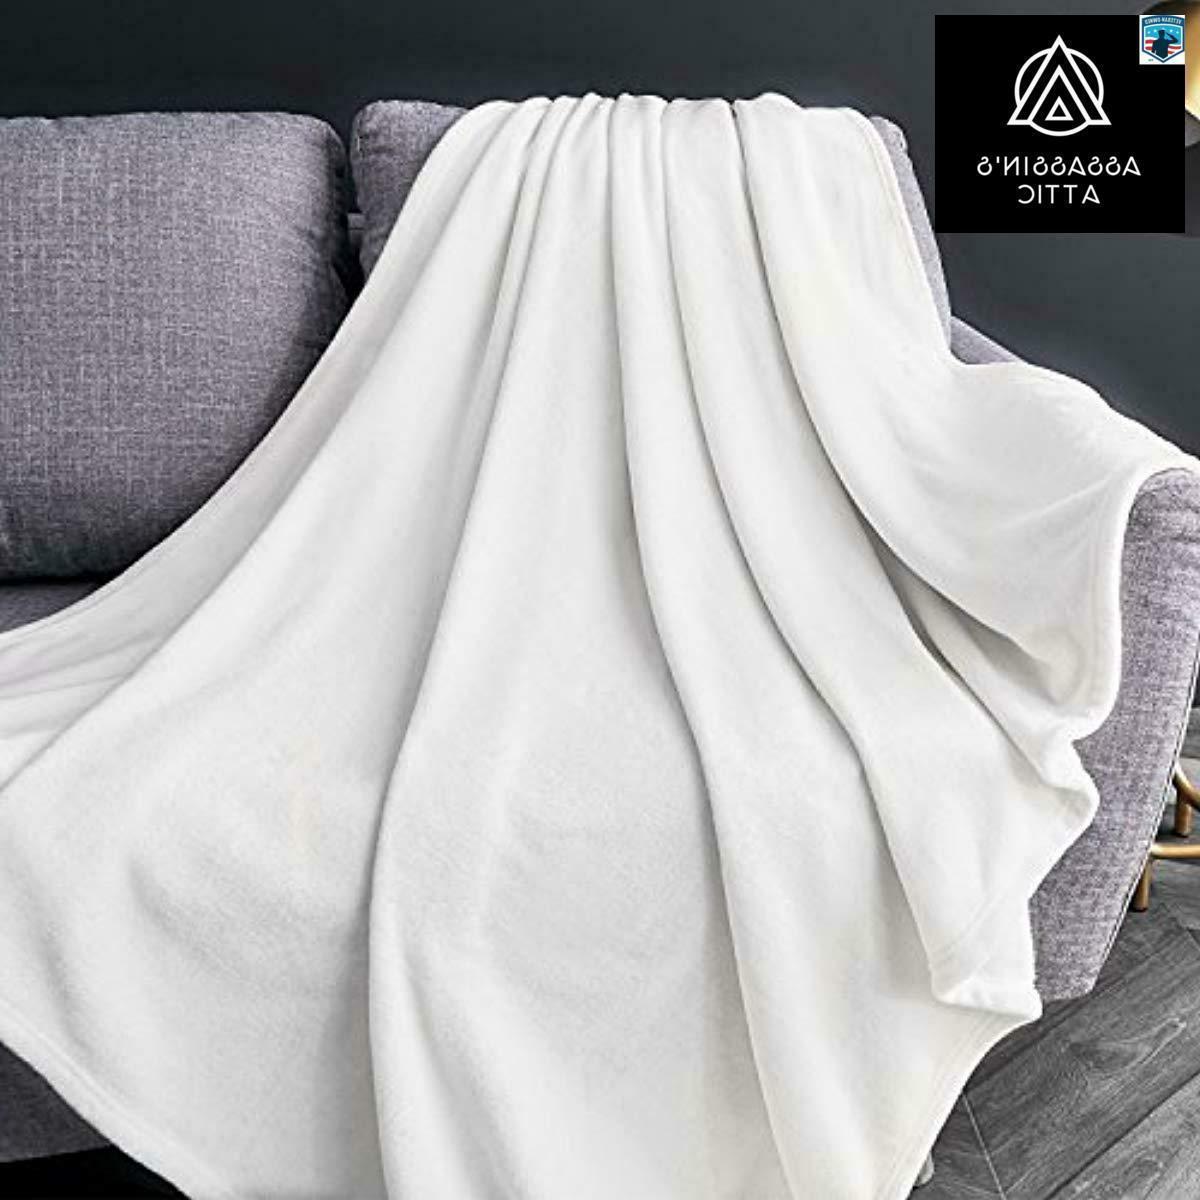 Bedsure Size White Lightweight Blanket Cozy